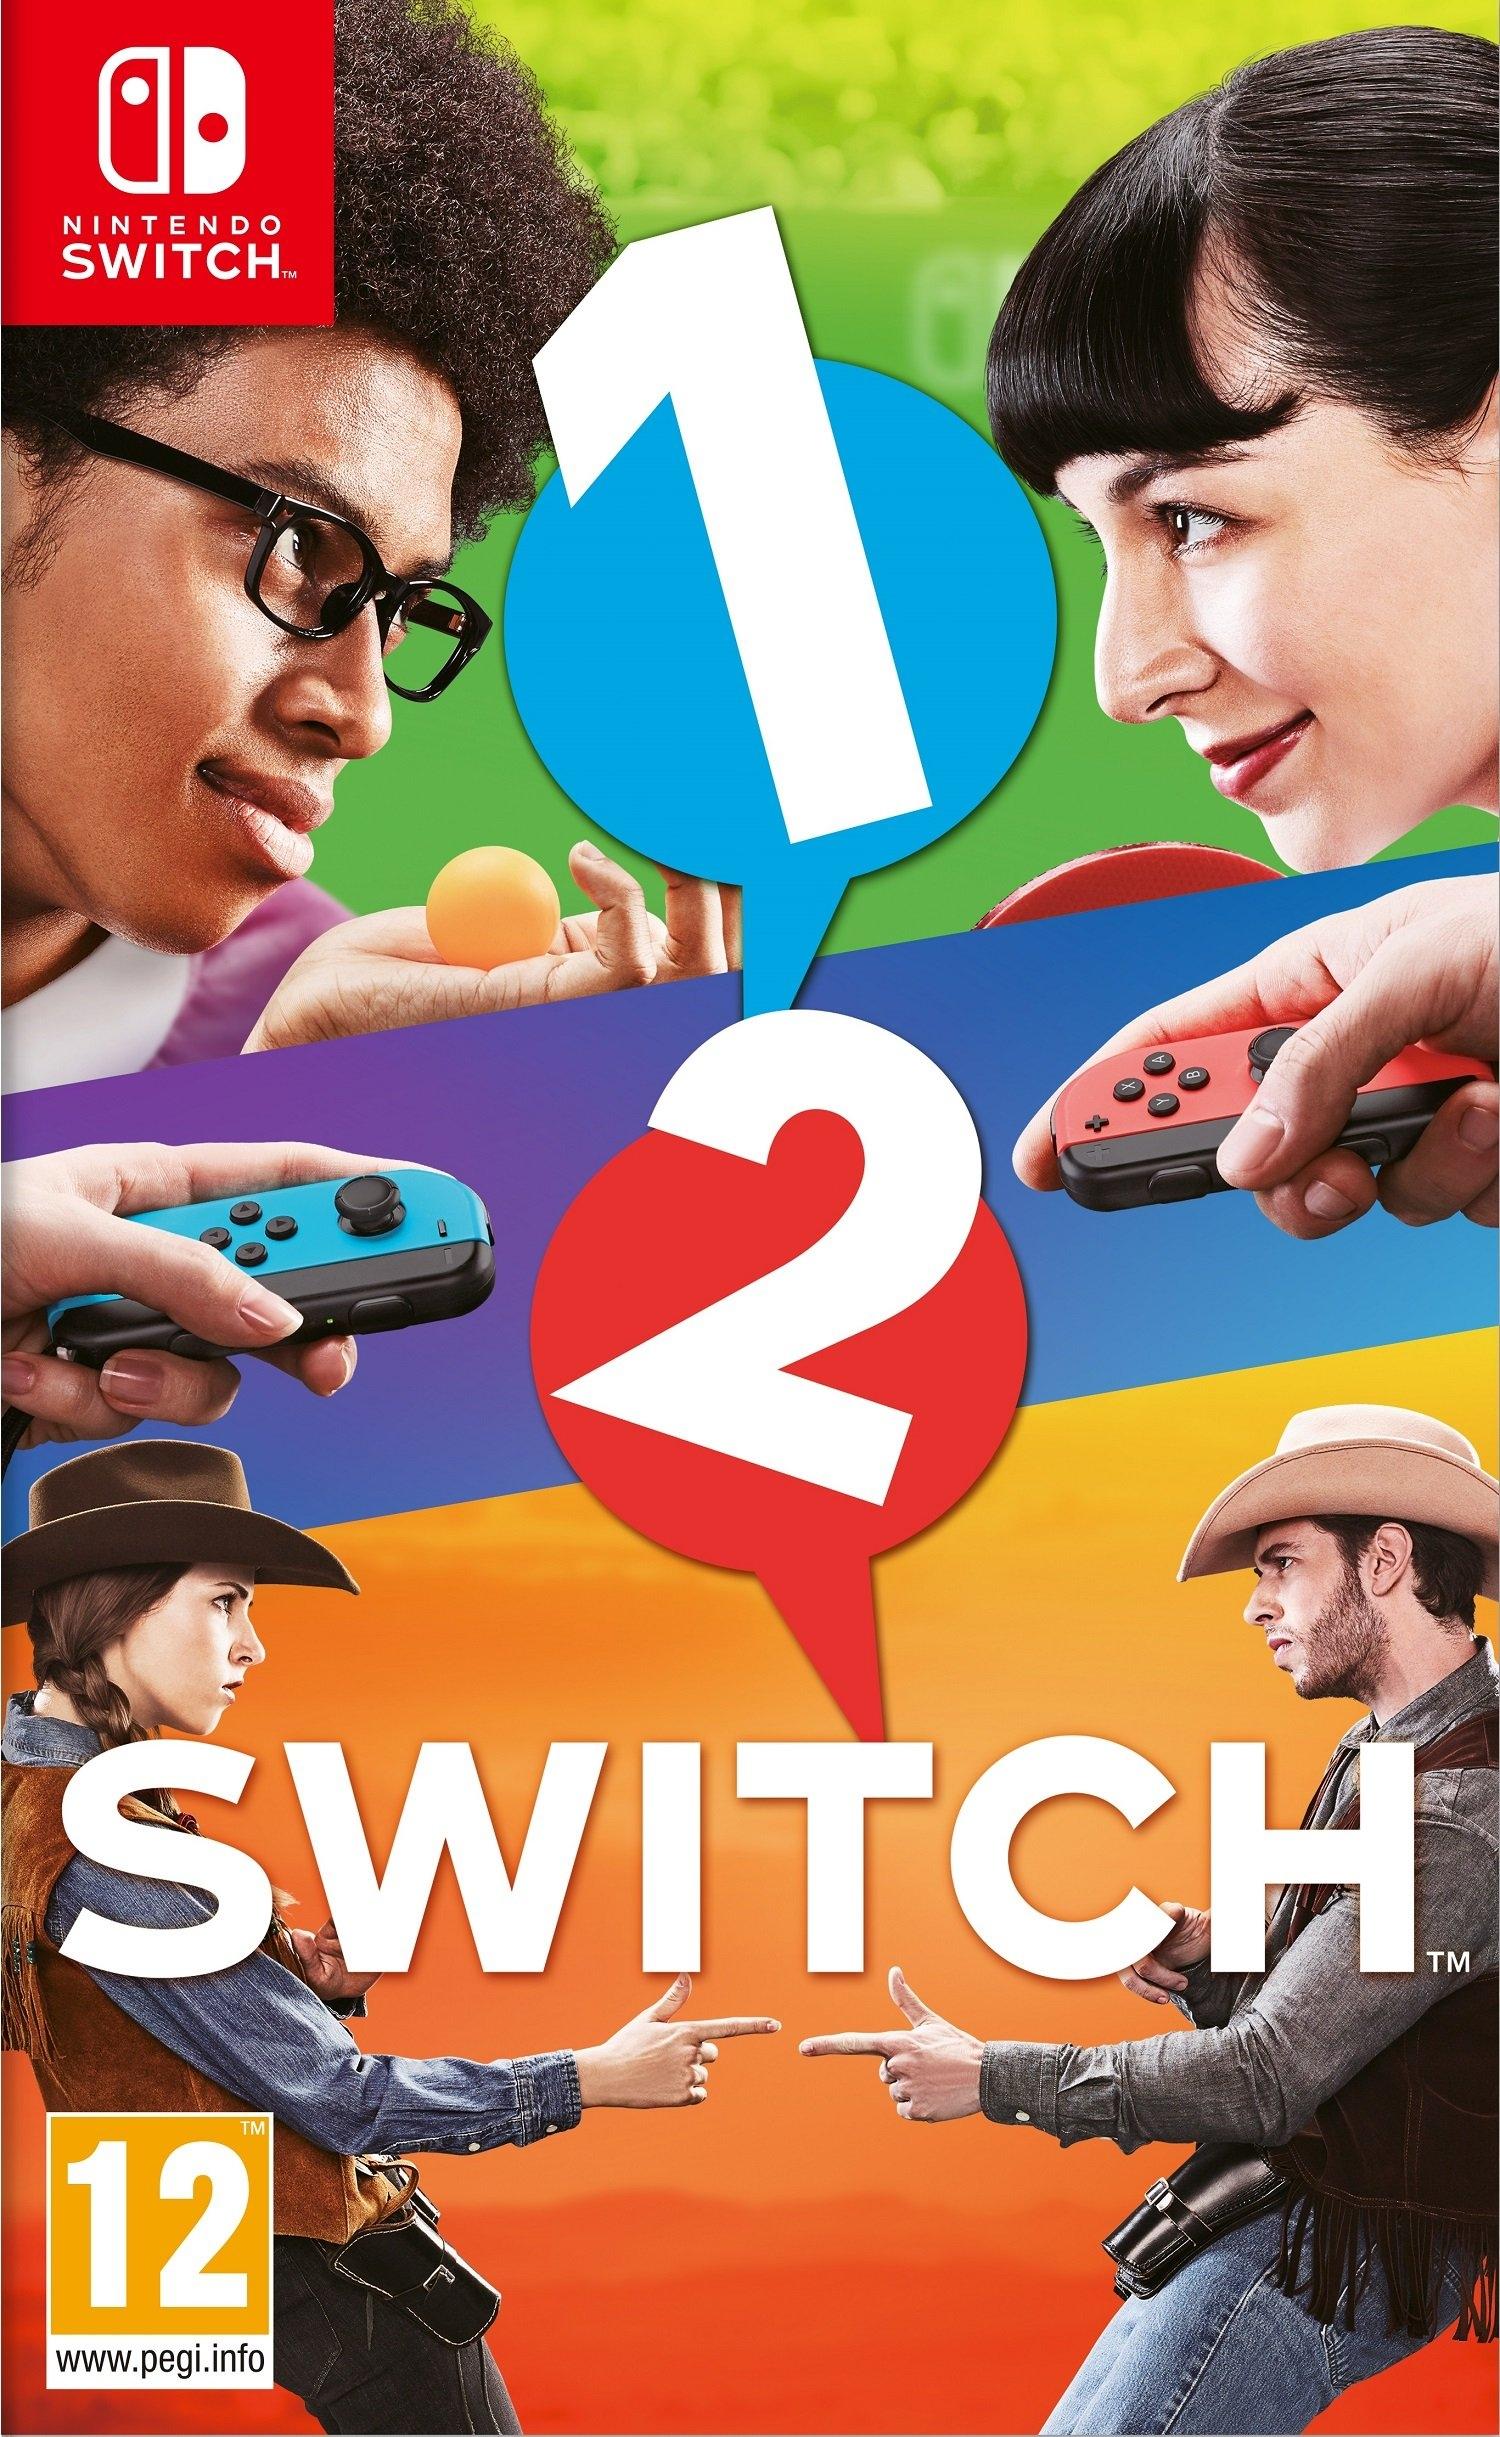 NINTENDO Switch, 1-2 Switch nu online bestellen